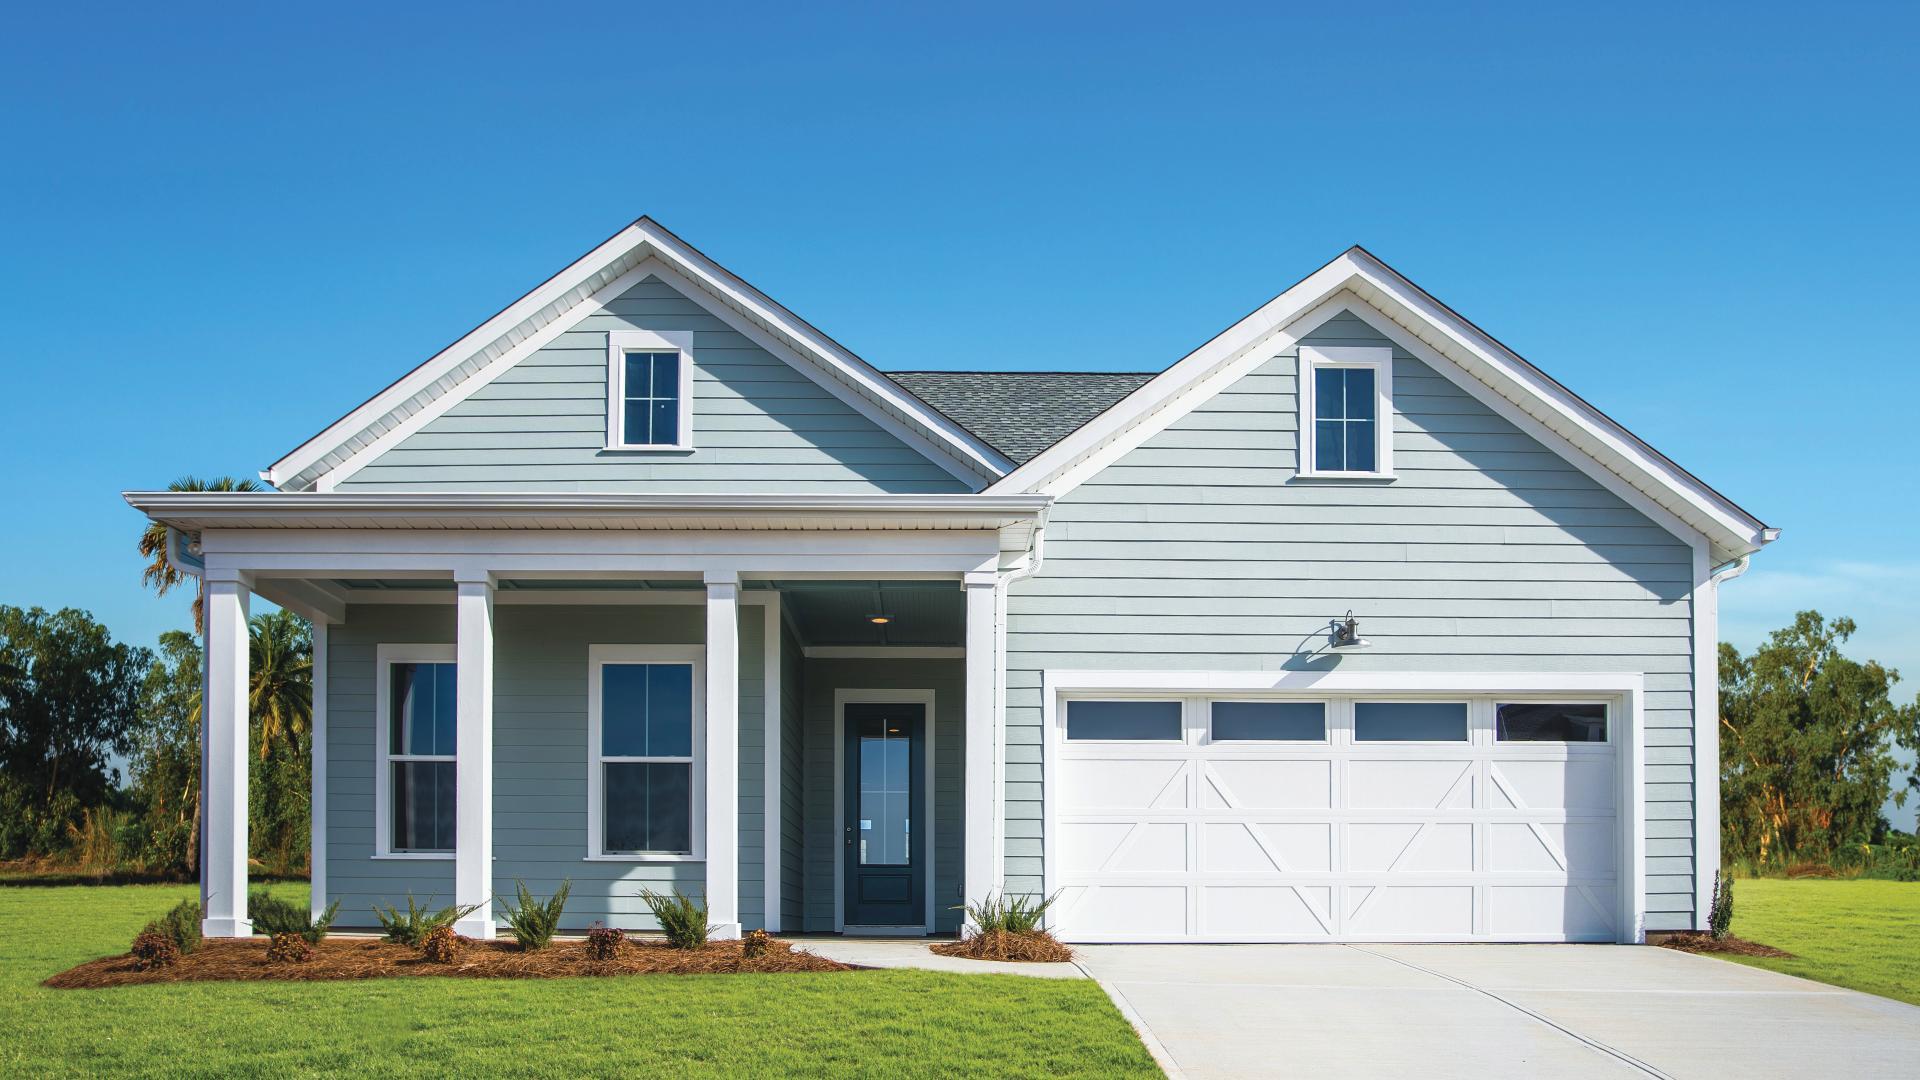 Warren home design